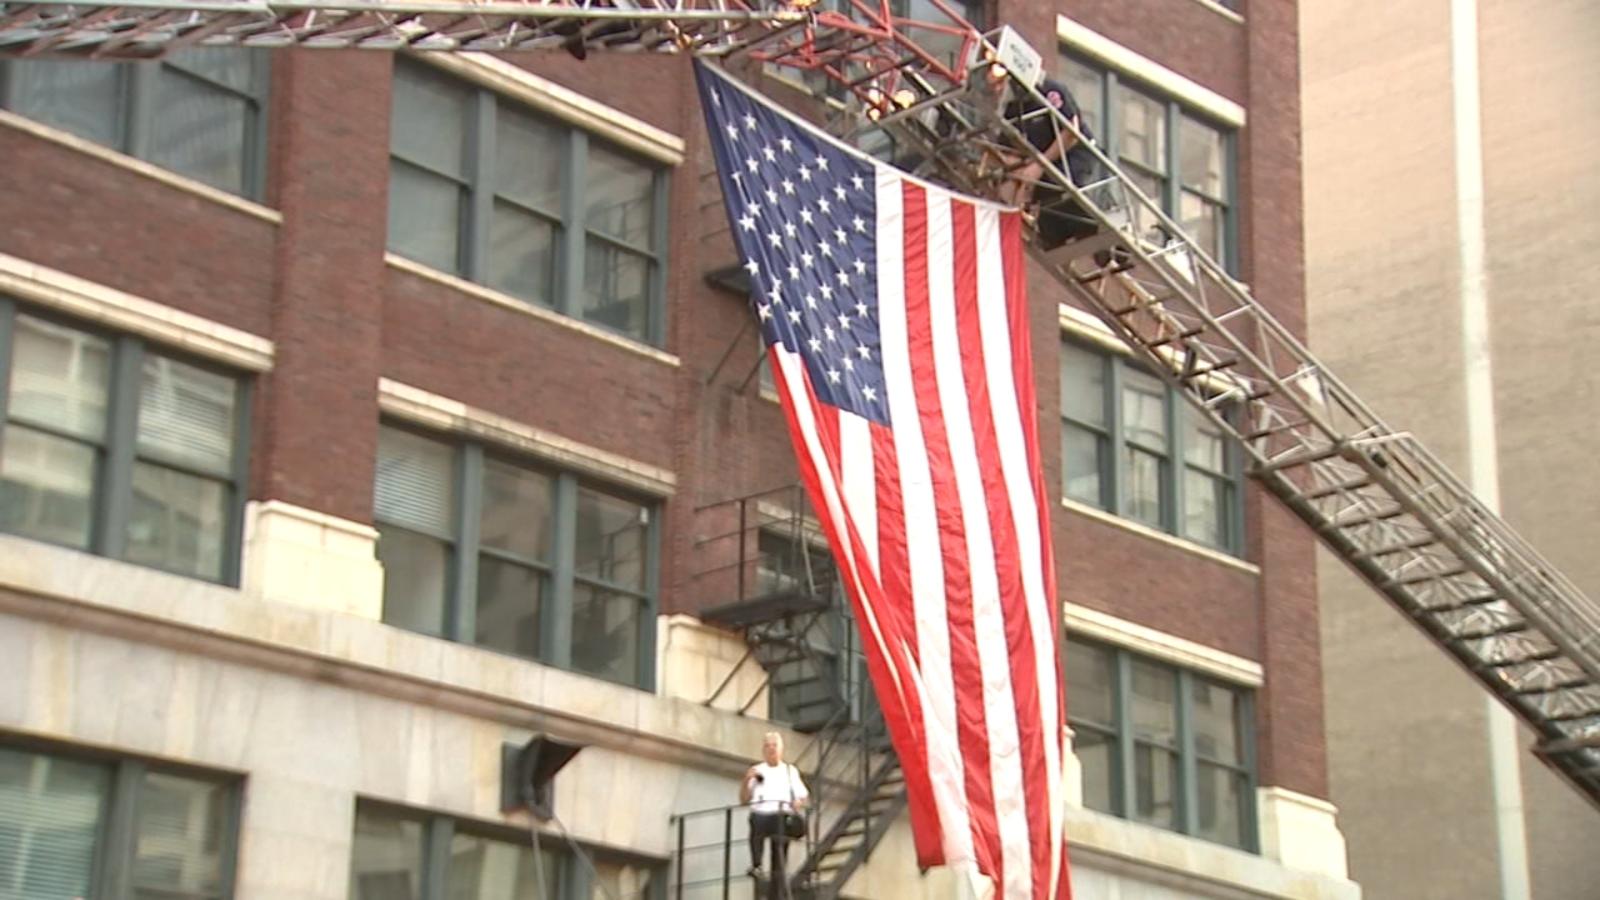 9/11 Memorial: Chicago-area ceremonies mark somber anniversary